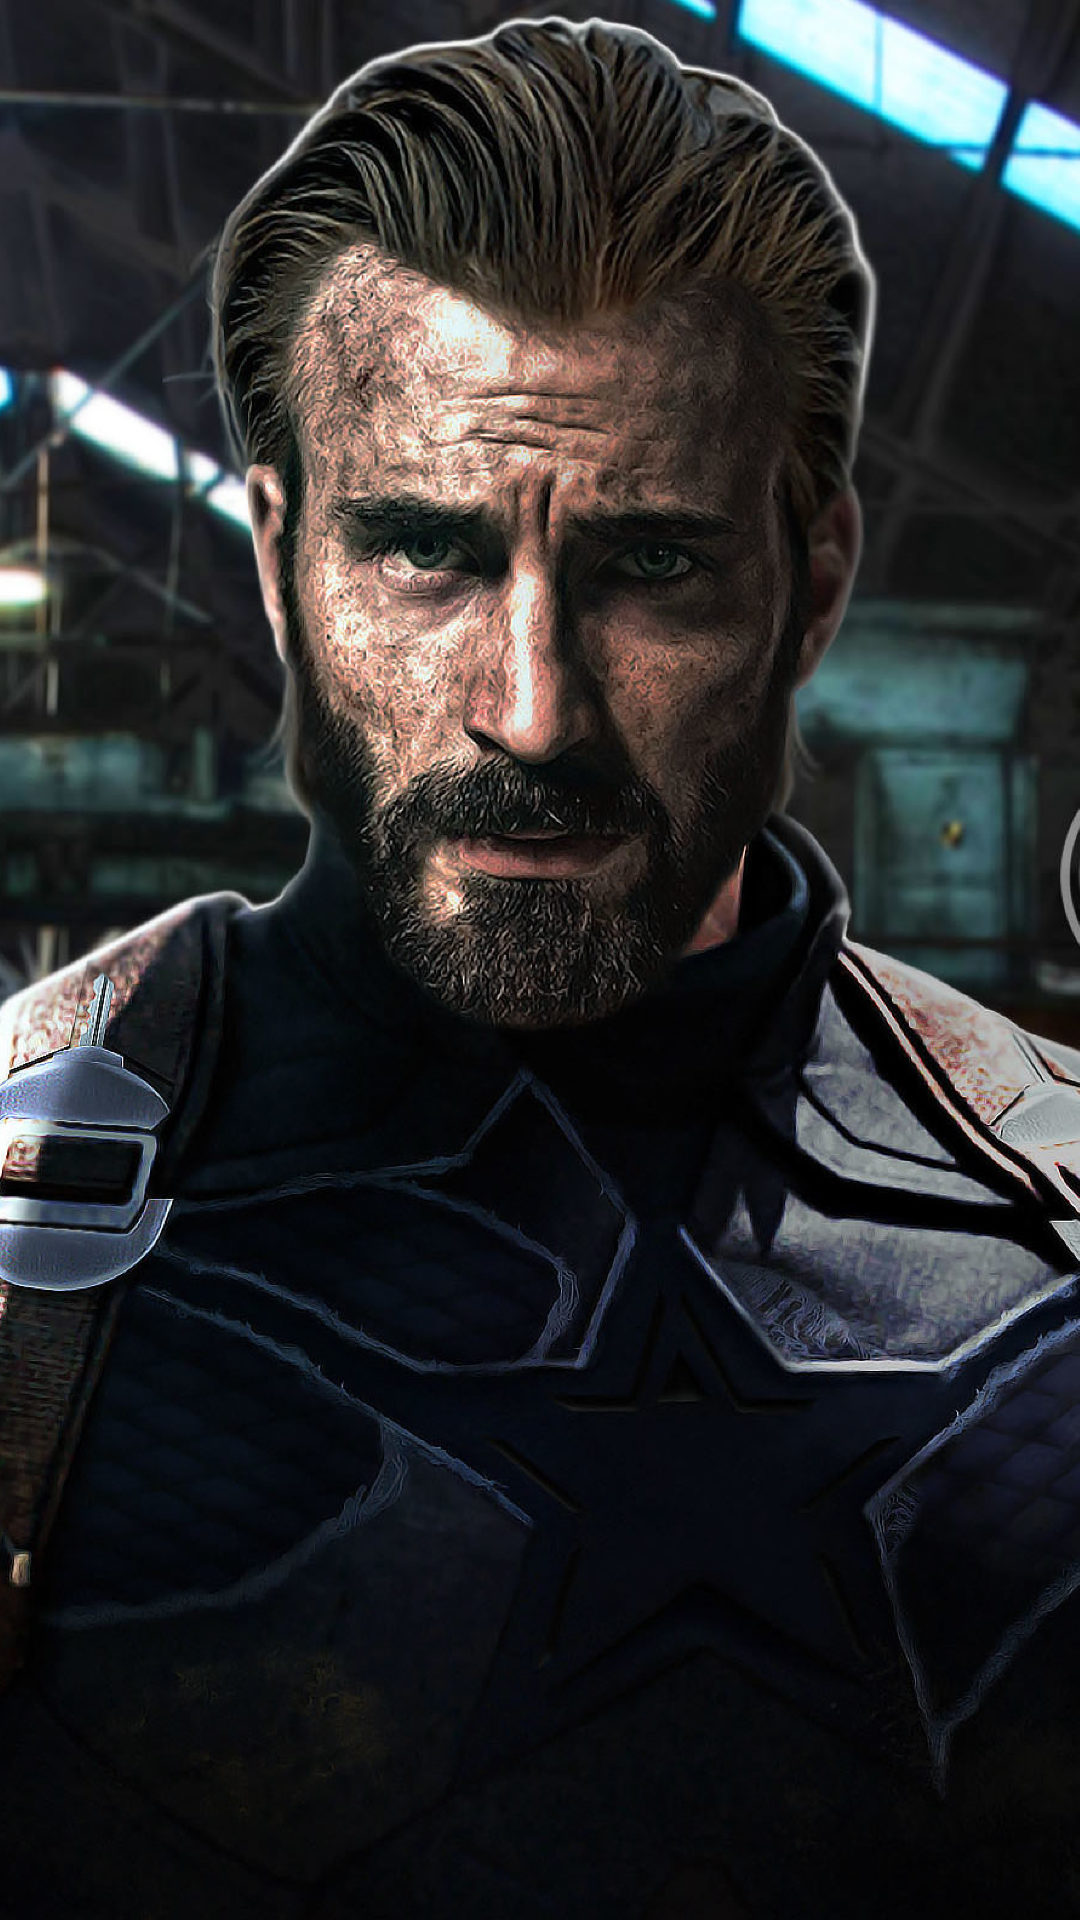 1080x1920 Captain America Beard Look In Infinity War Iphone 7 6s 1080x1920